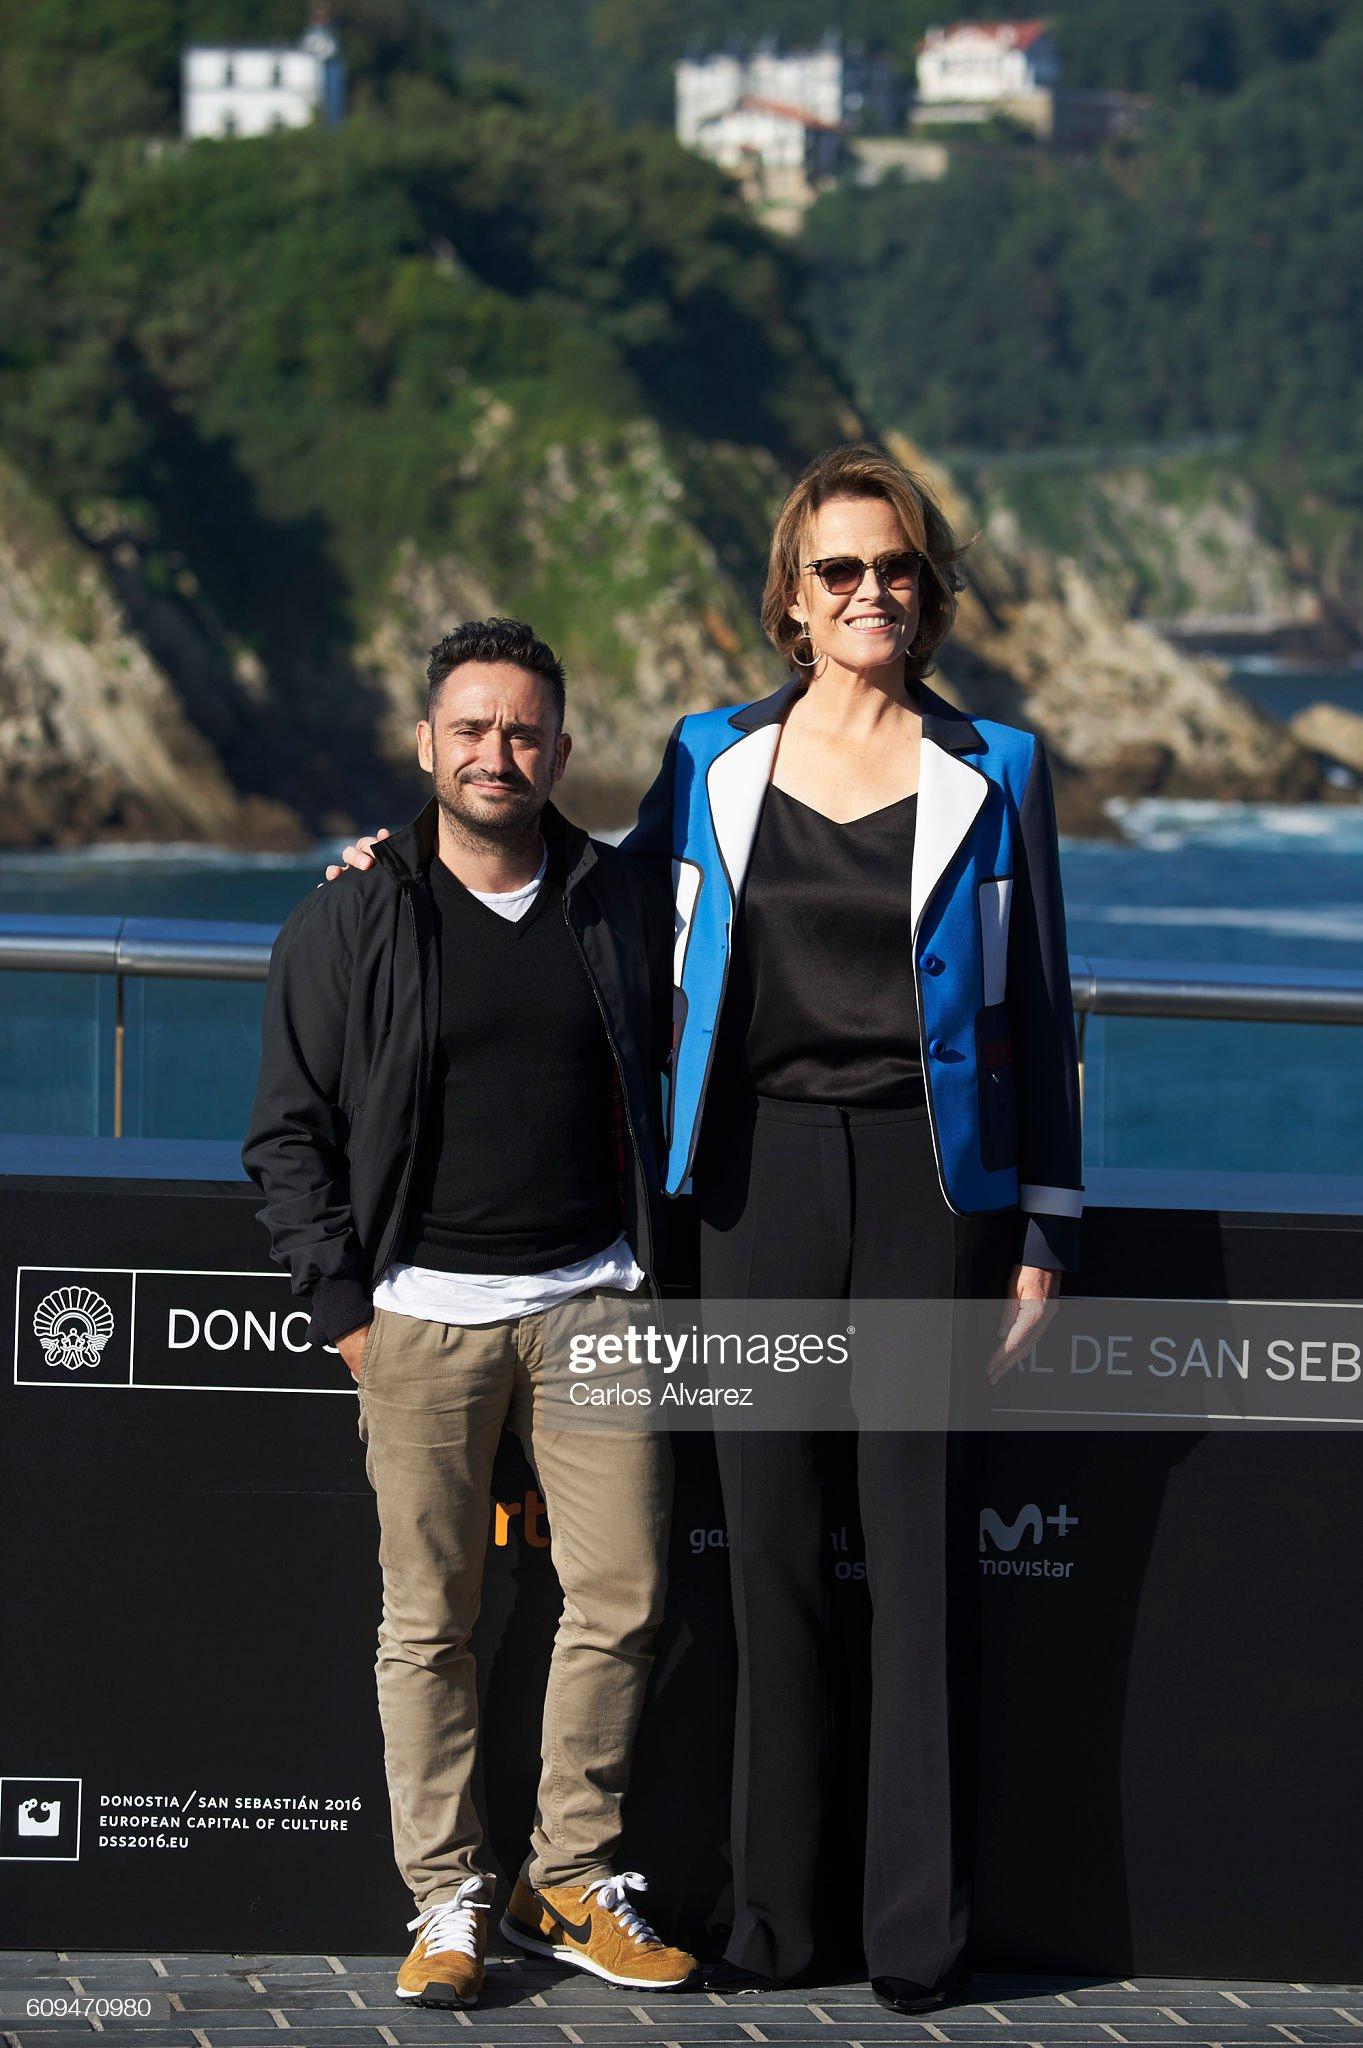 ¿Cuánto mide Sigourney Weaver? - Altura - Real height Aspanish-director-juan-antonio-bayona-and-actress-sigourney-weaver-a-picture-id609470980?s=2048x2048